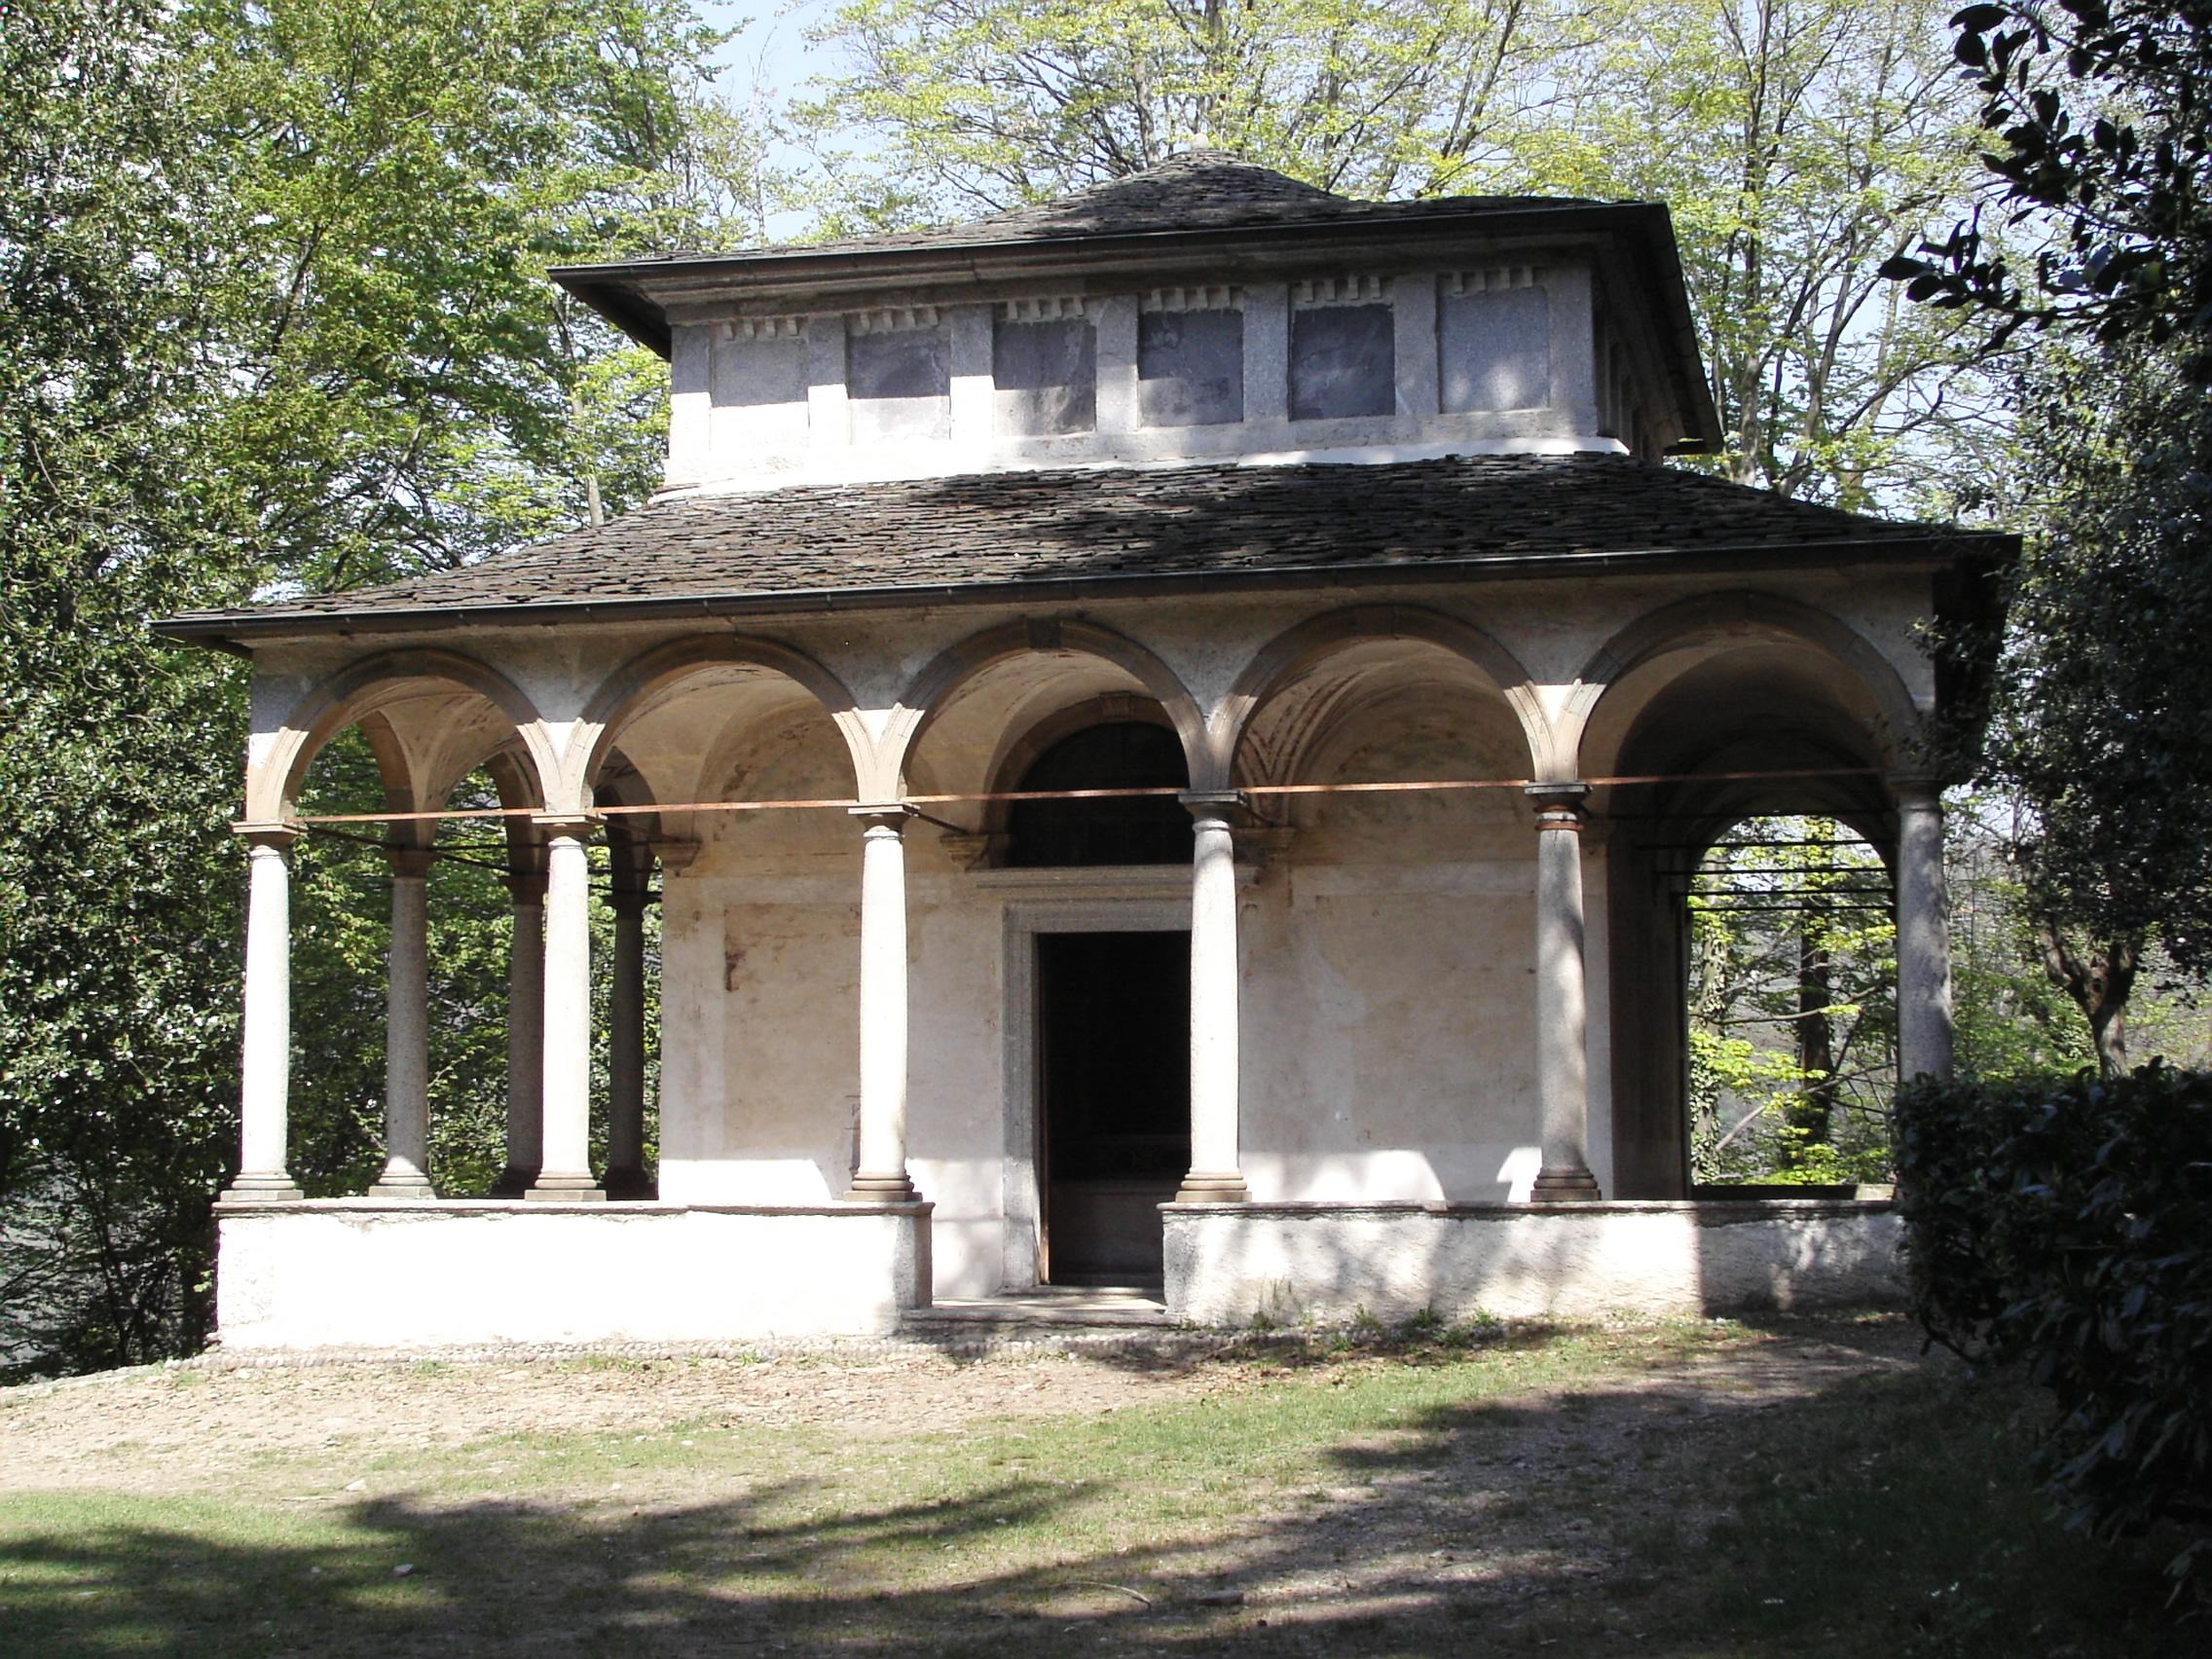 Orta – Sacro Monte (4)